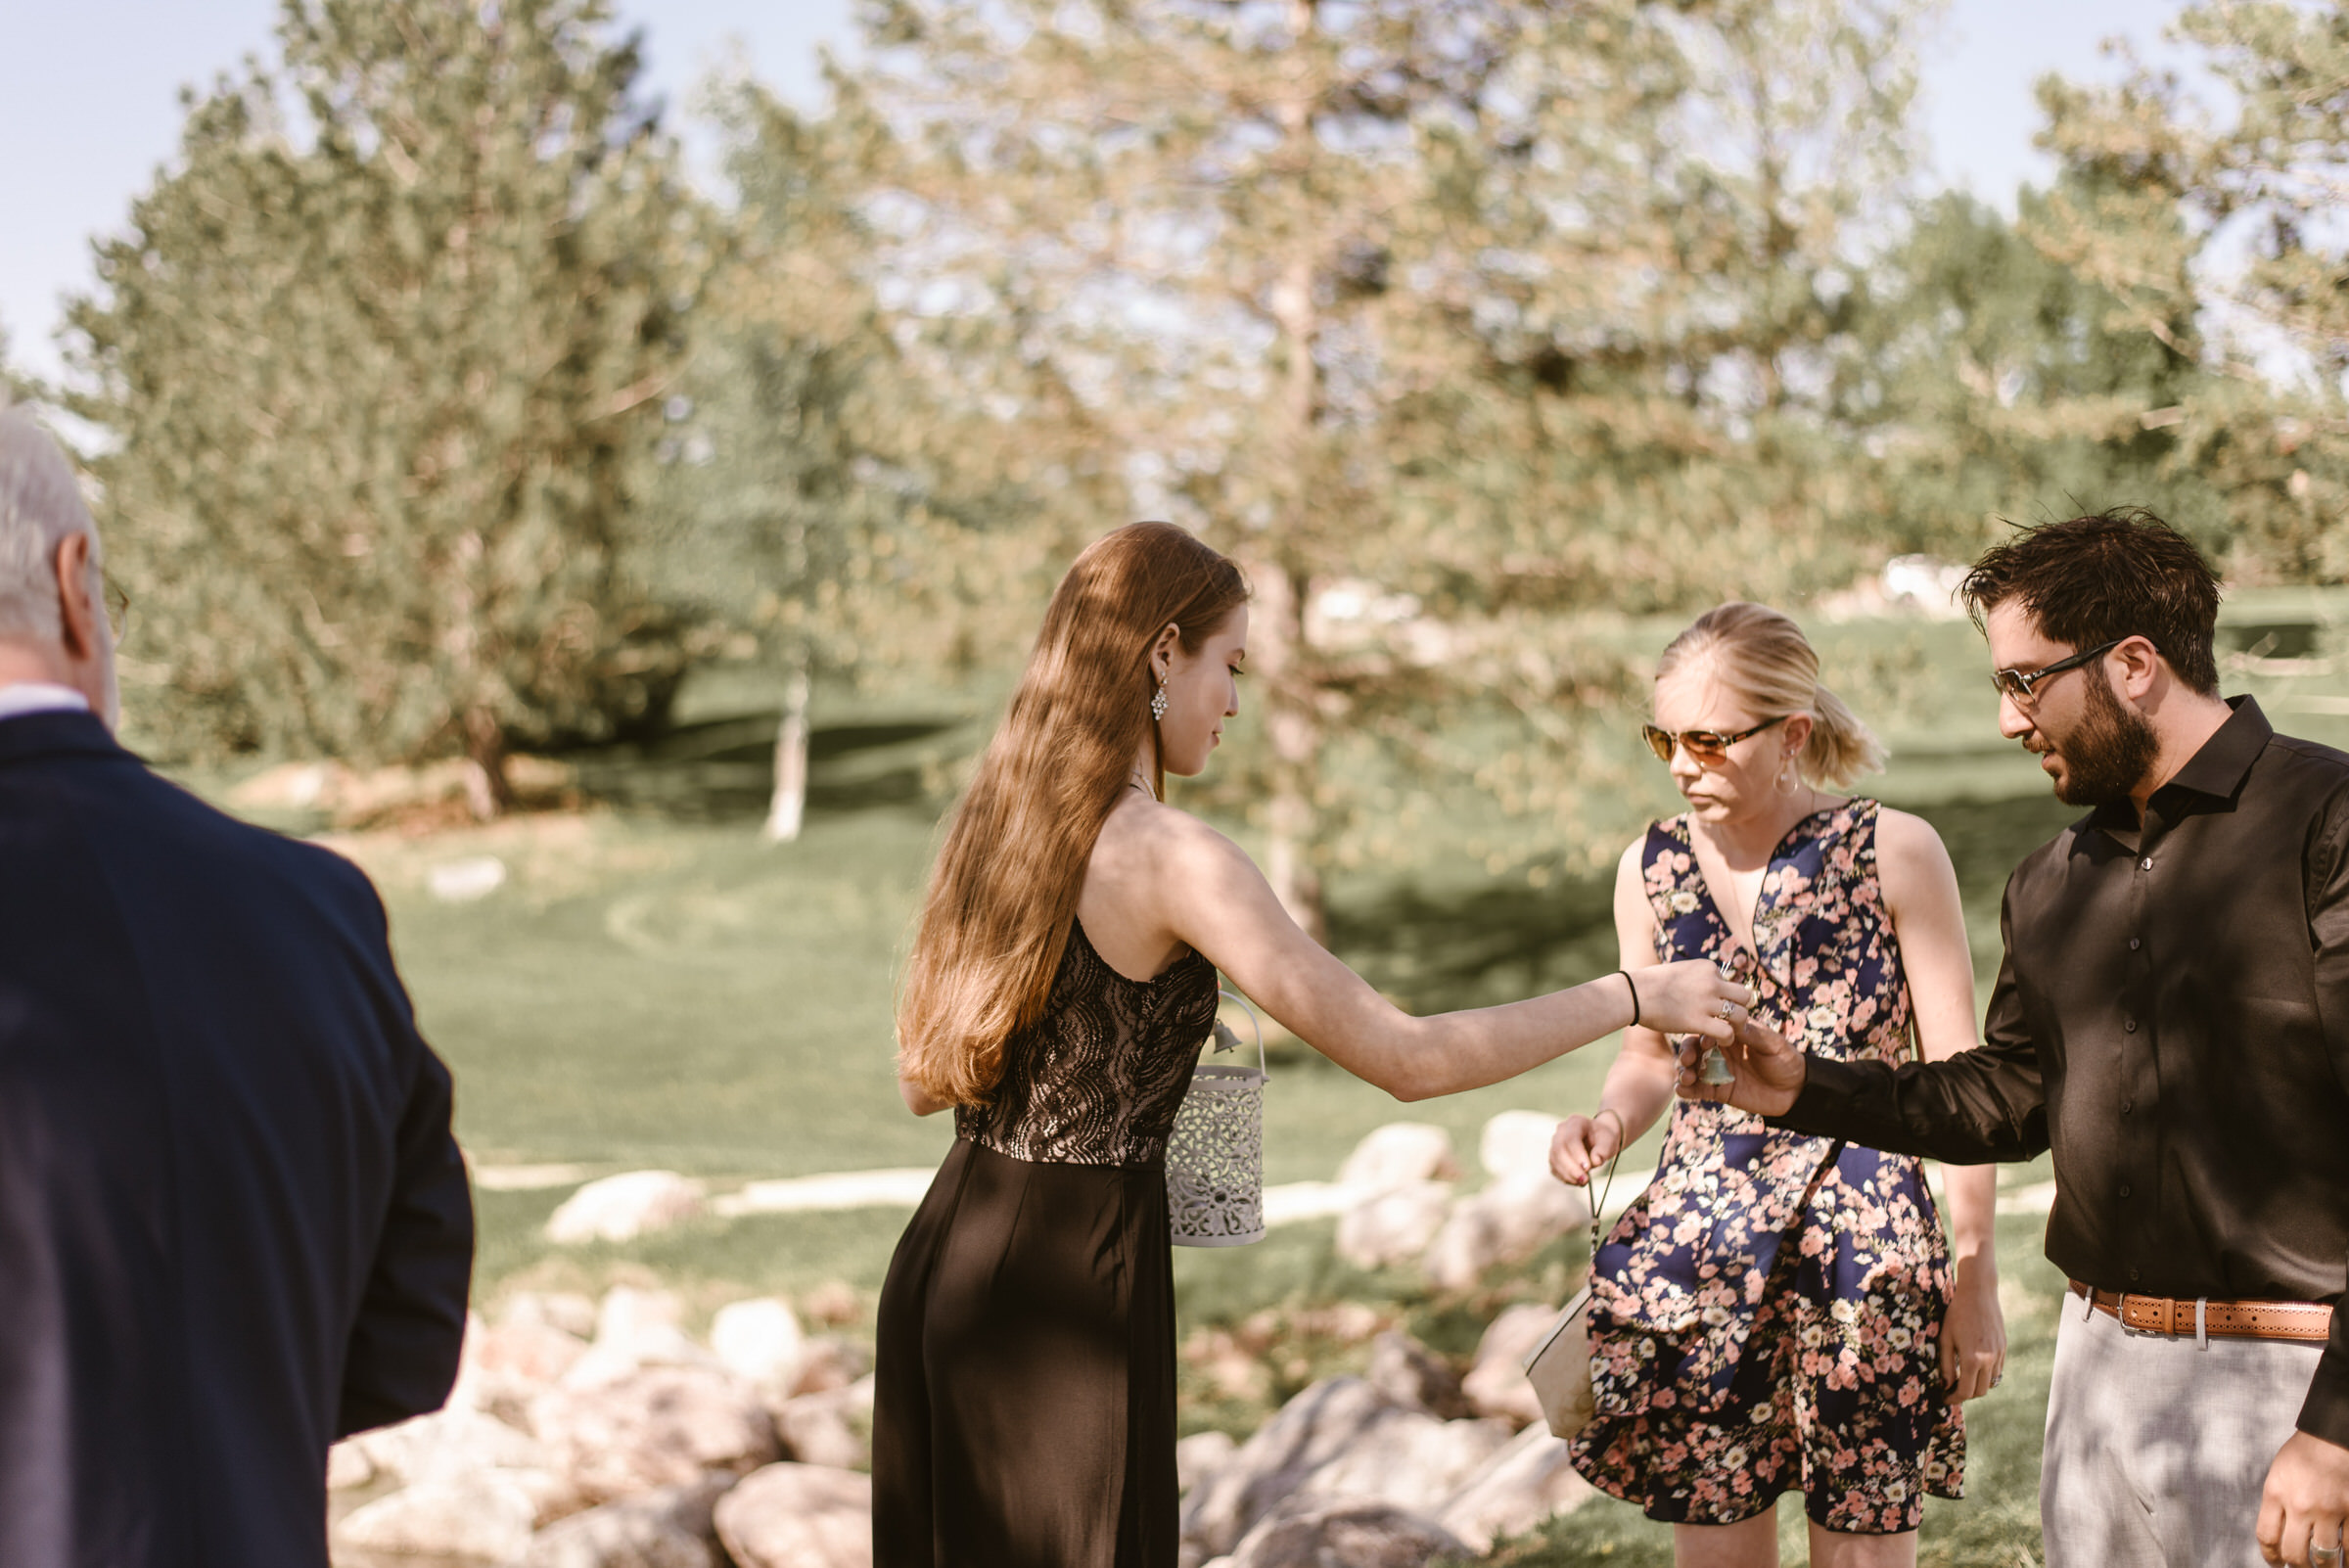 Wilderness-Ridge-Lincoln-Nebraska-Wedding-Kaylie-Sirek-Photography-046.jpg